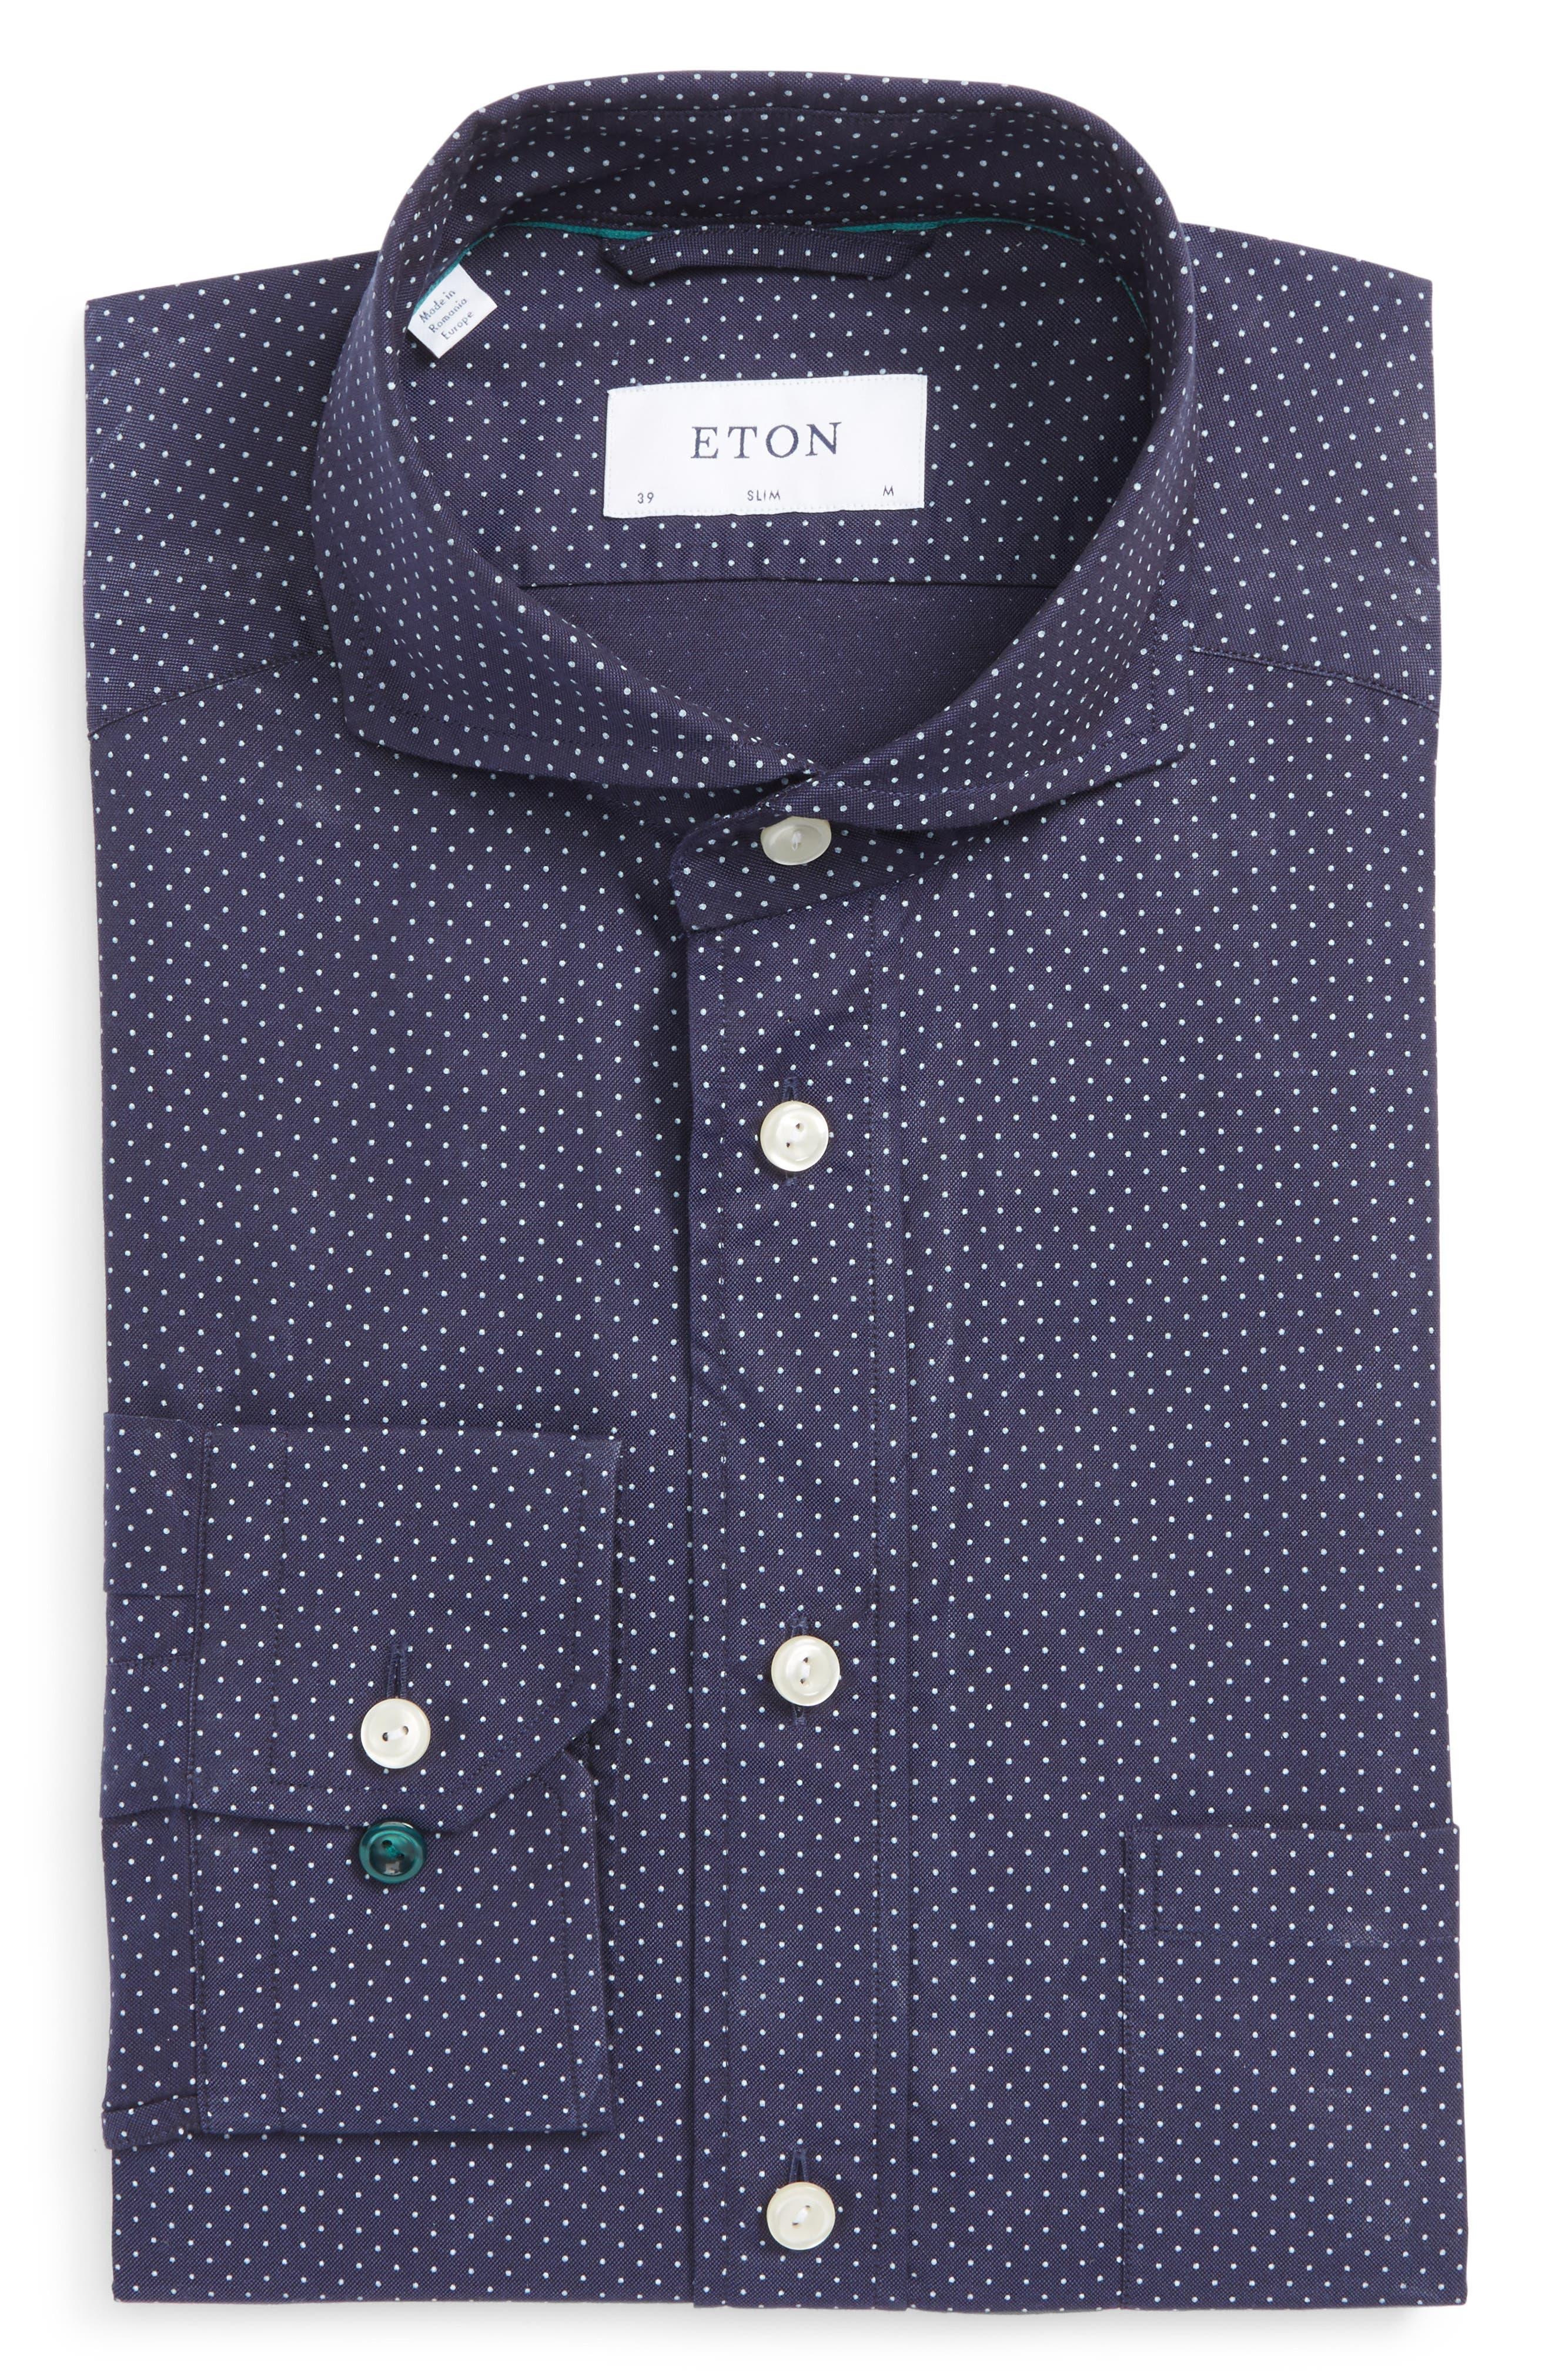 Eton Slim Fit Microdot Dress Shirt